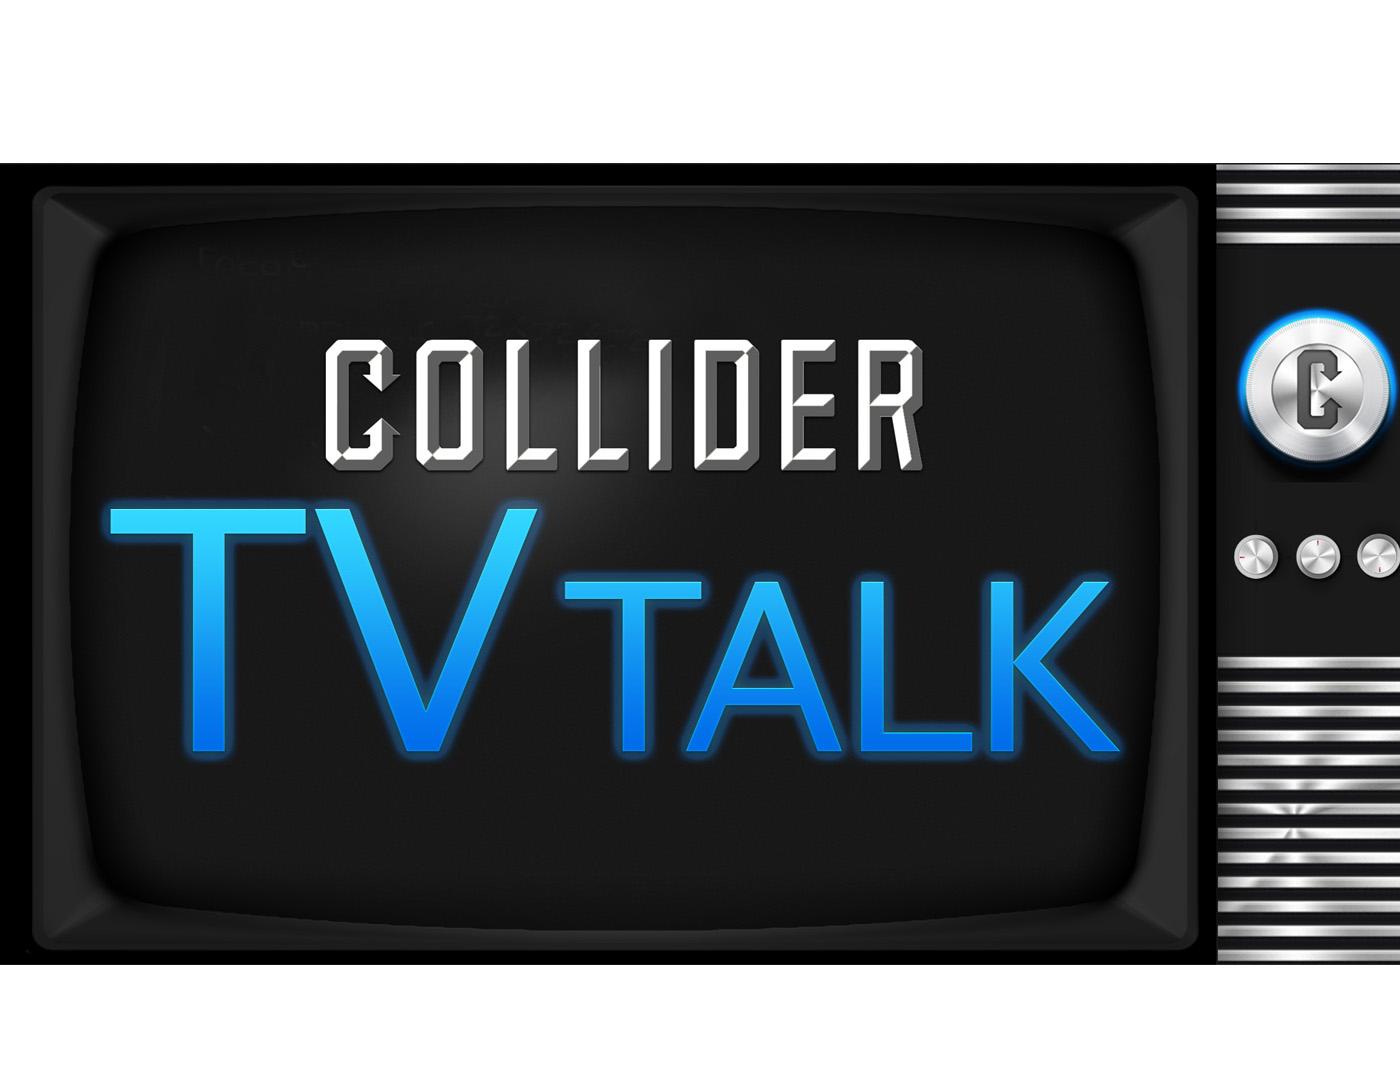 New Iron Fist Photos, Golden Globe Nominations - Collider TV Talk